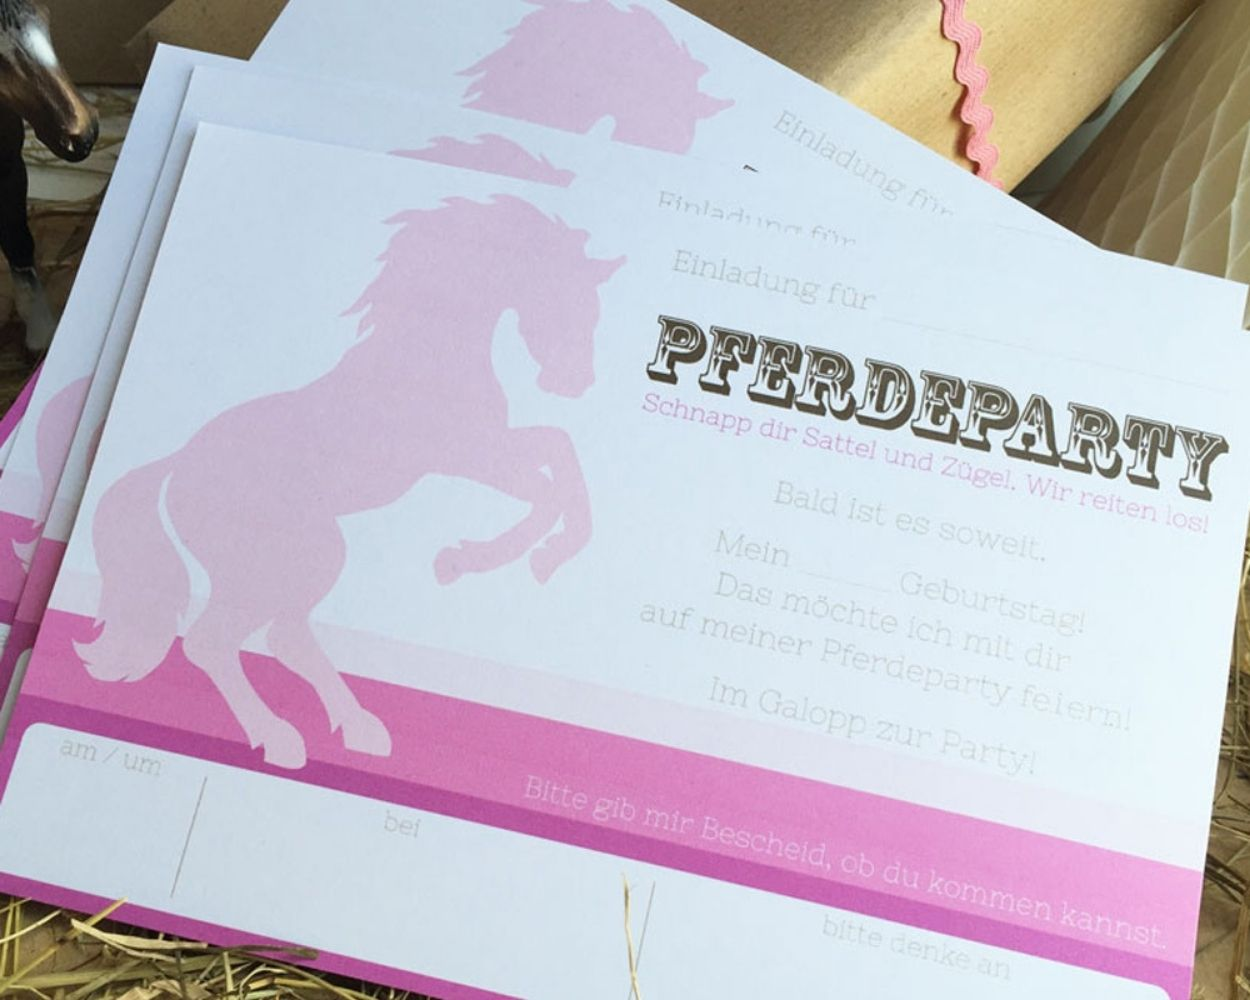 Pferdegeburtstag Kindergeburtstag Einladung